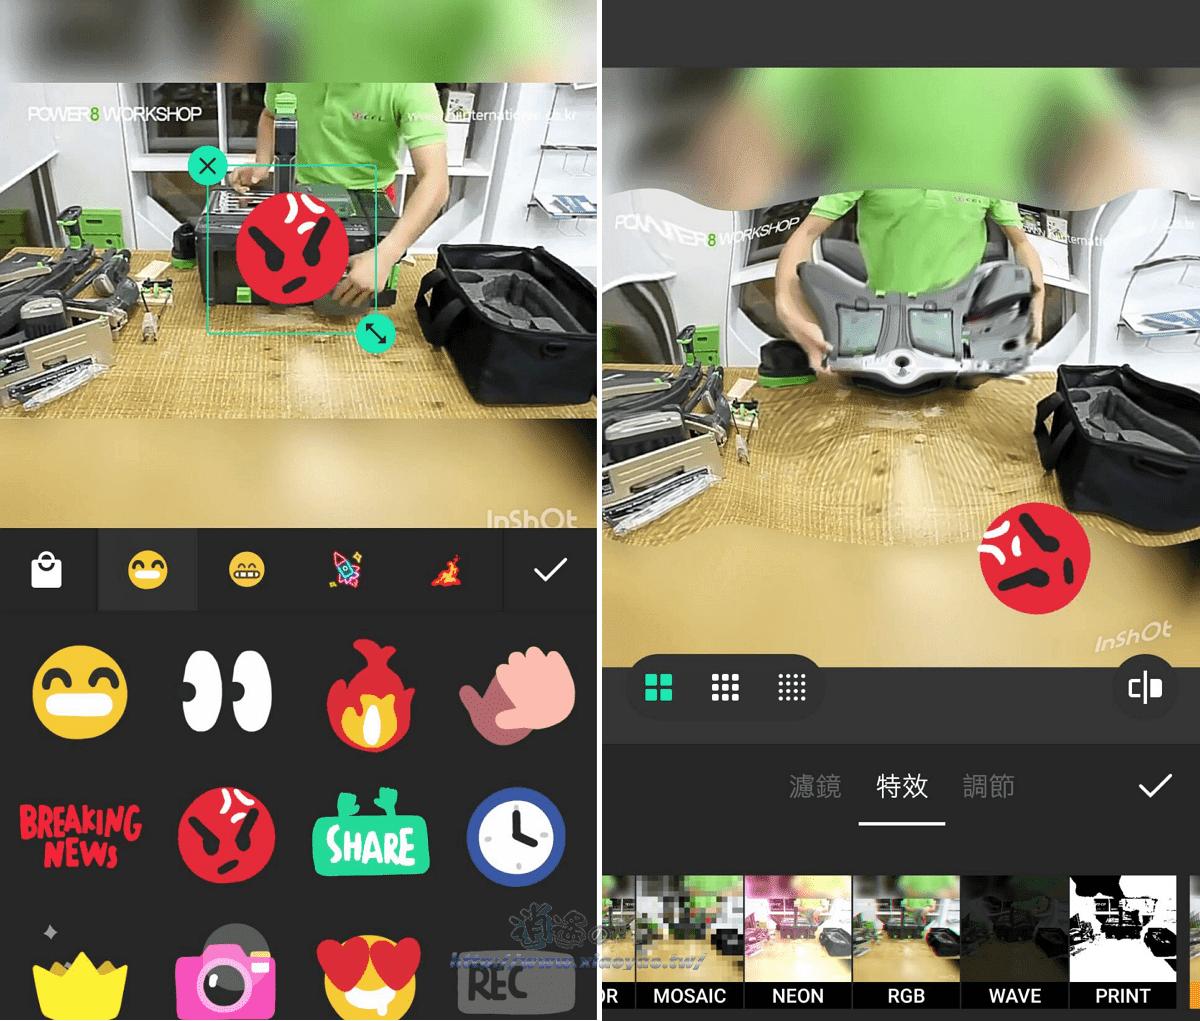 InShot 免費高清影片編輯和製作軟體